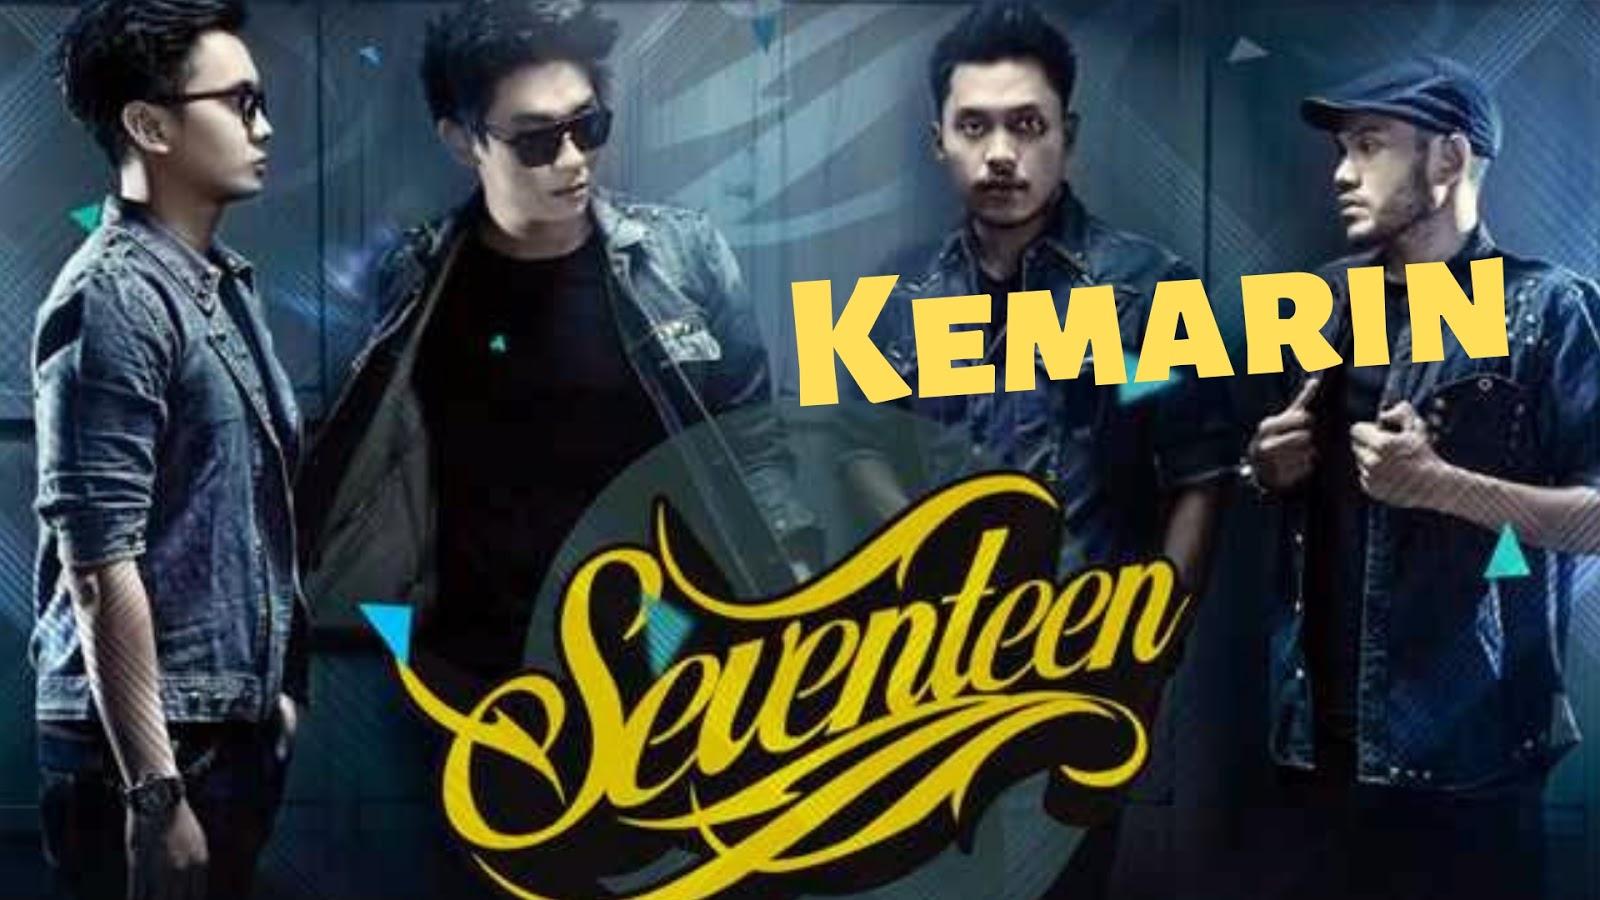 Seventeen band - Kemarin